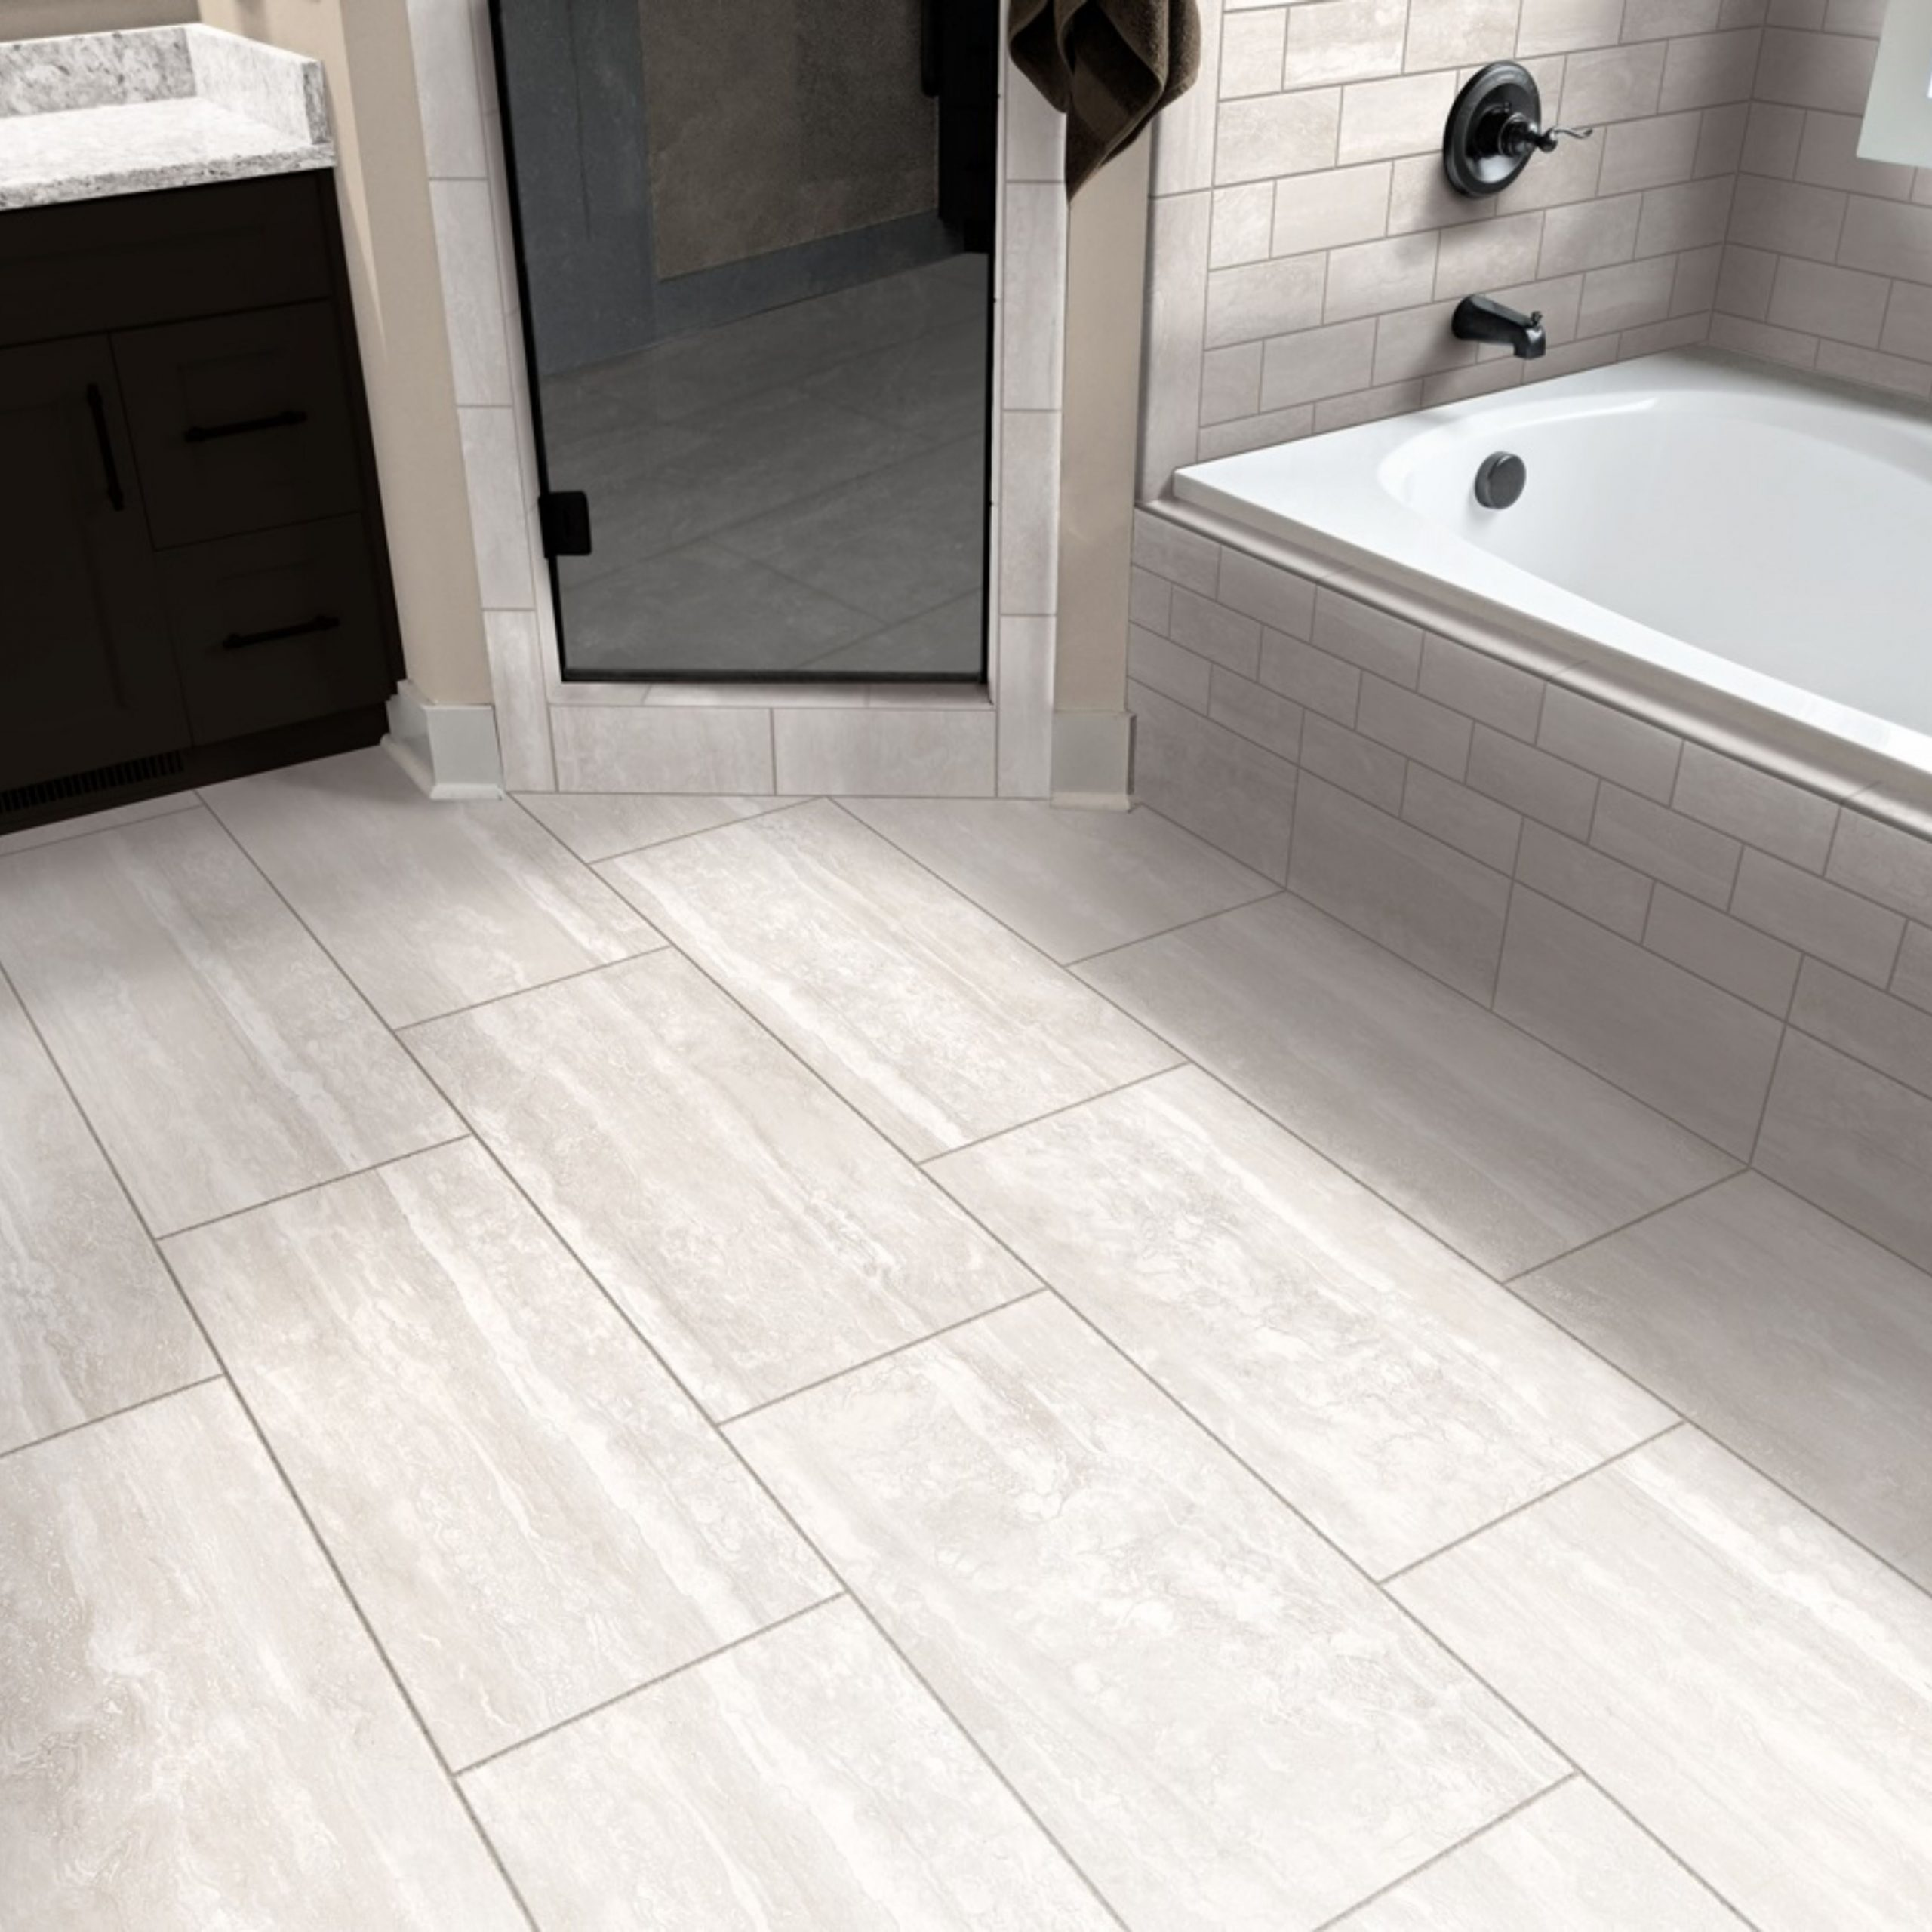 Porcelain Bathroom Floor Tile